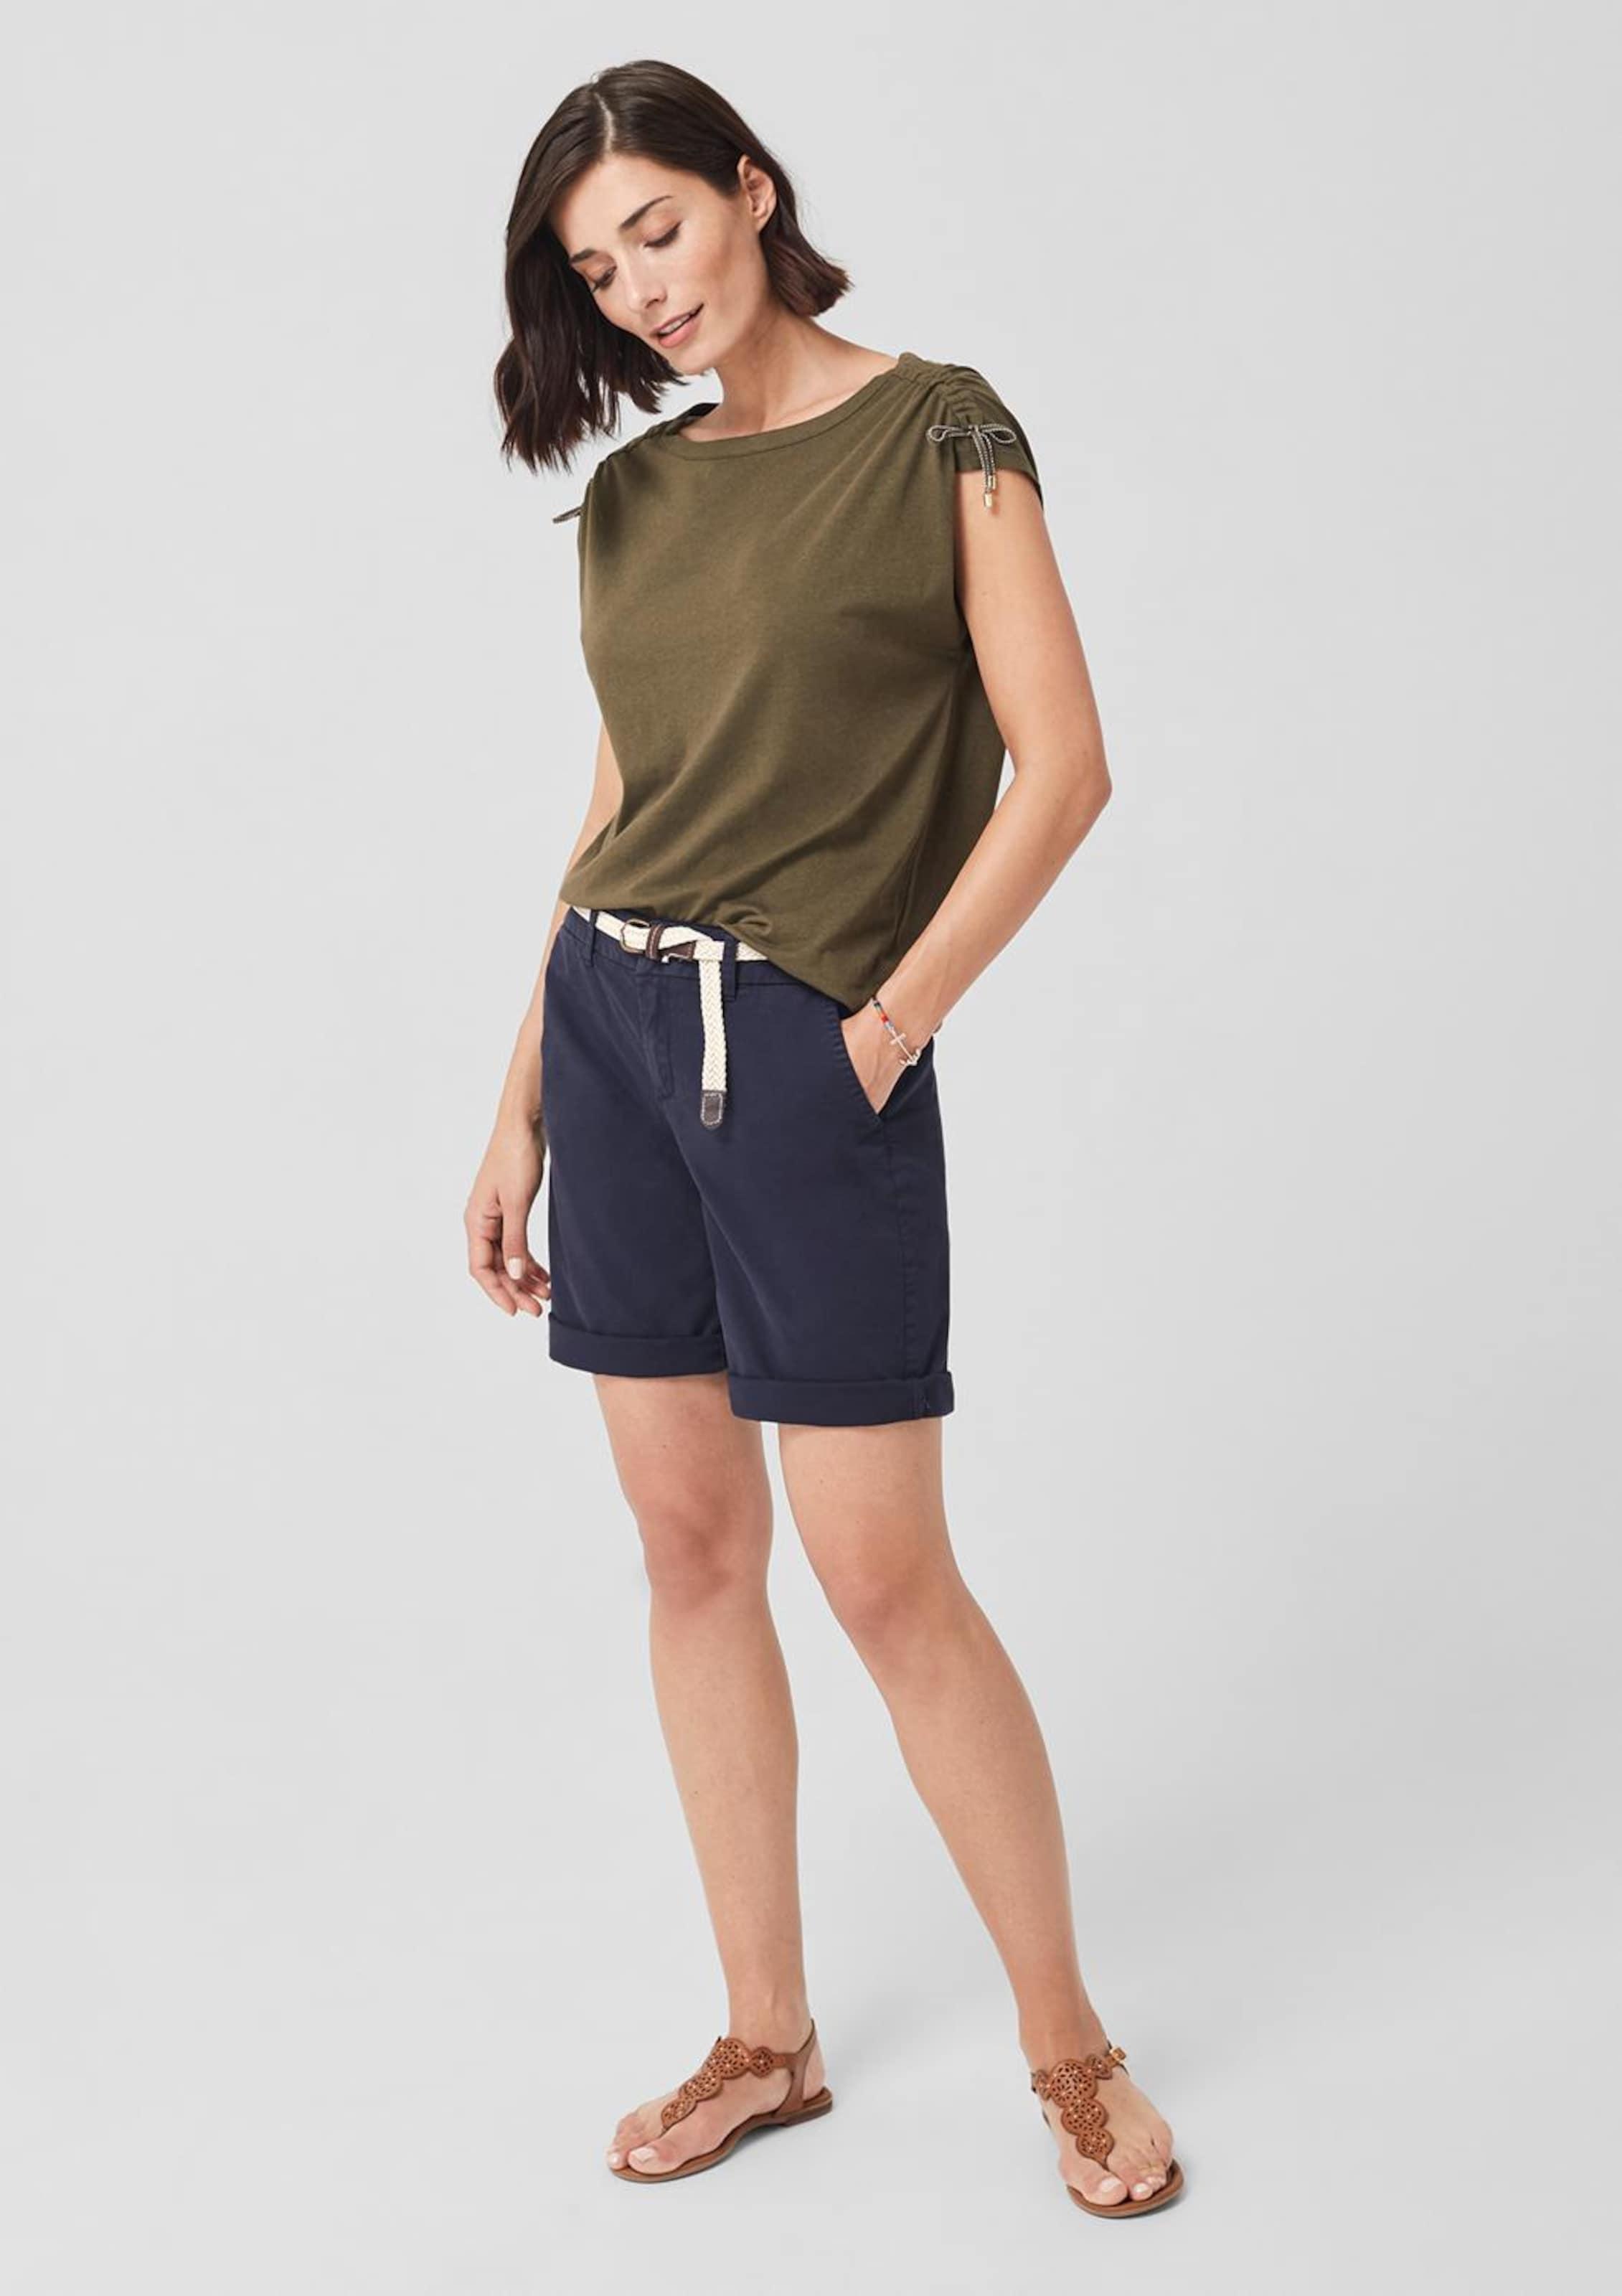 Red MarineWeiß S Shorts oliver In Label zGqSMVpU